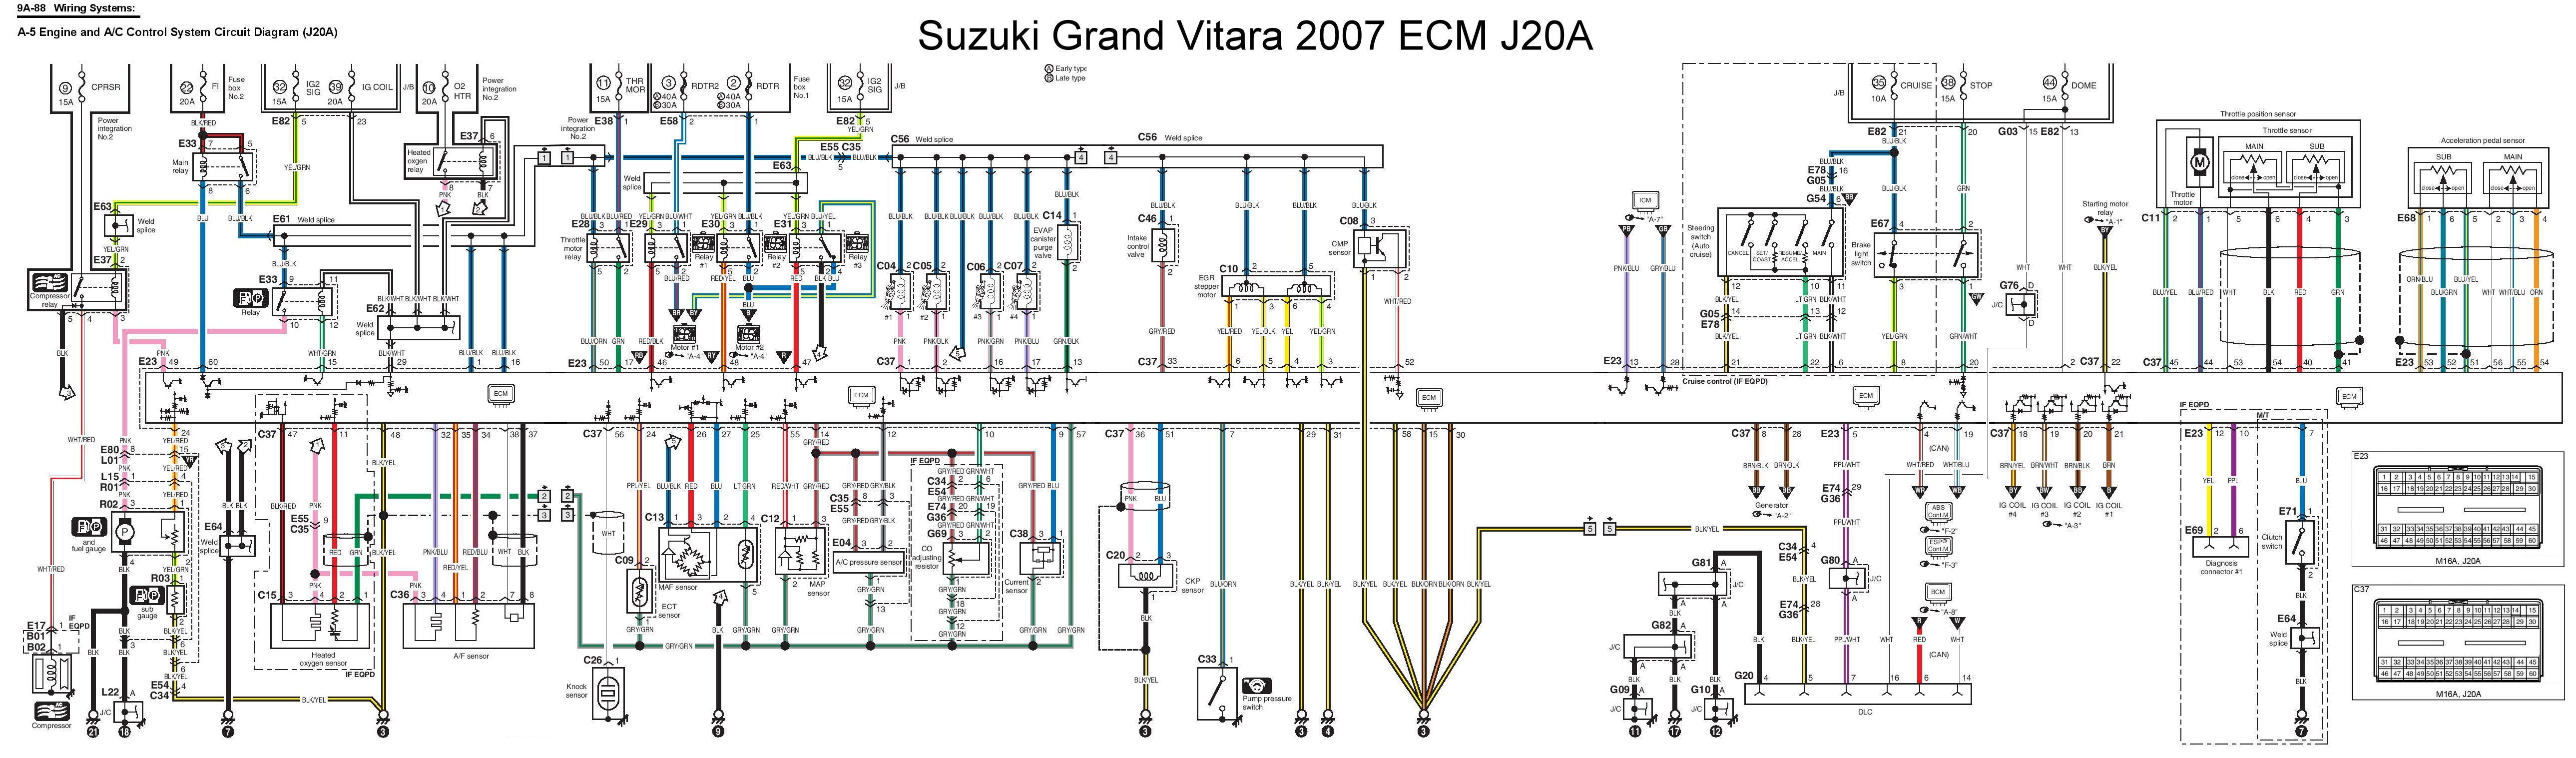 Honda Ecu Pinout Diagram